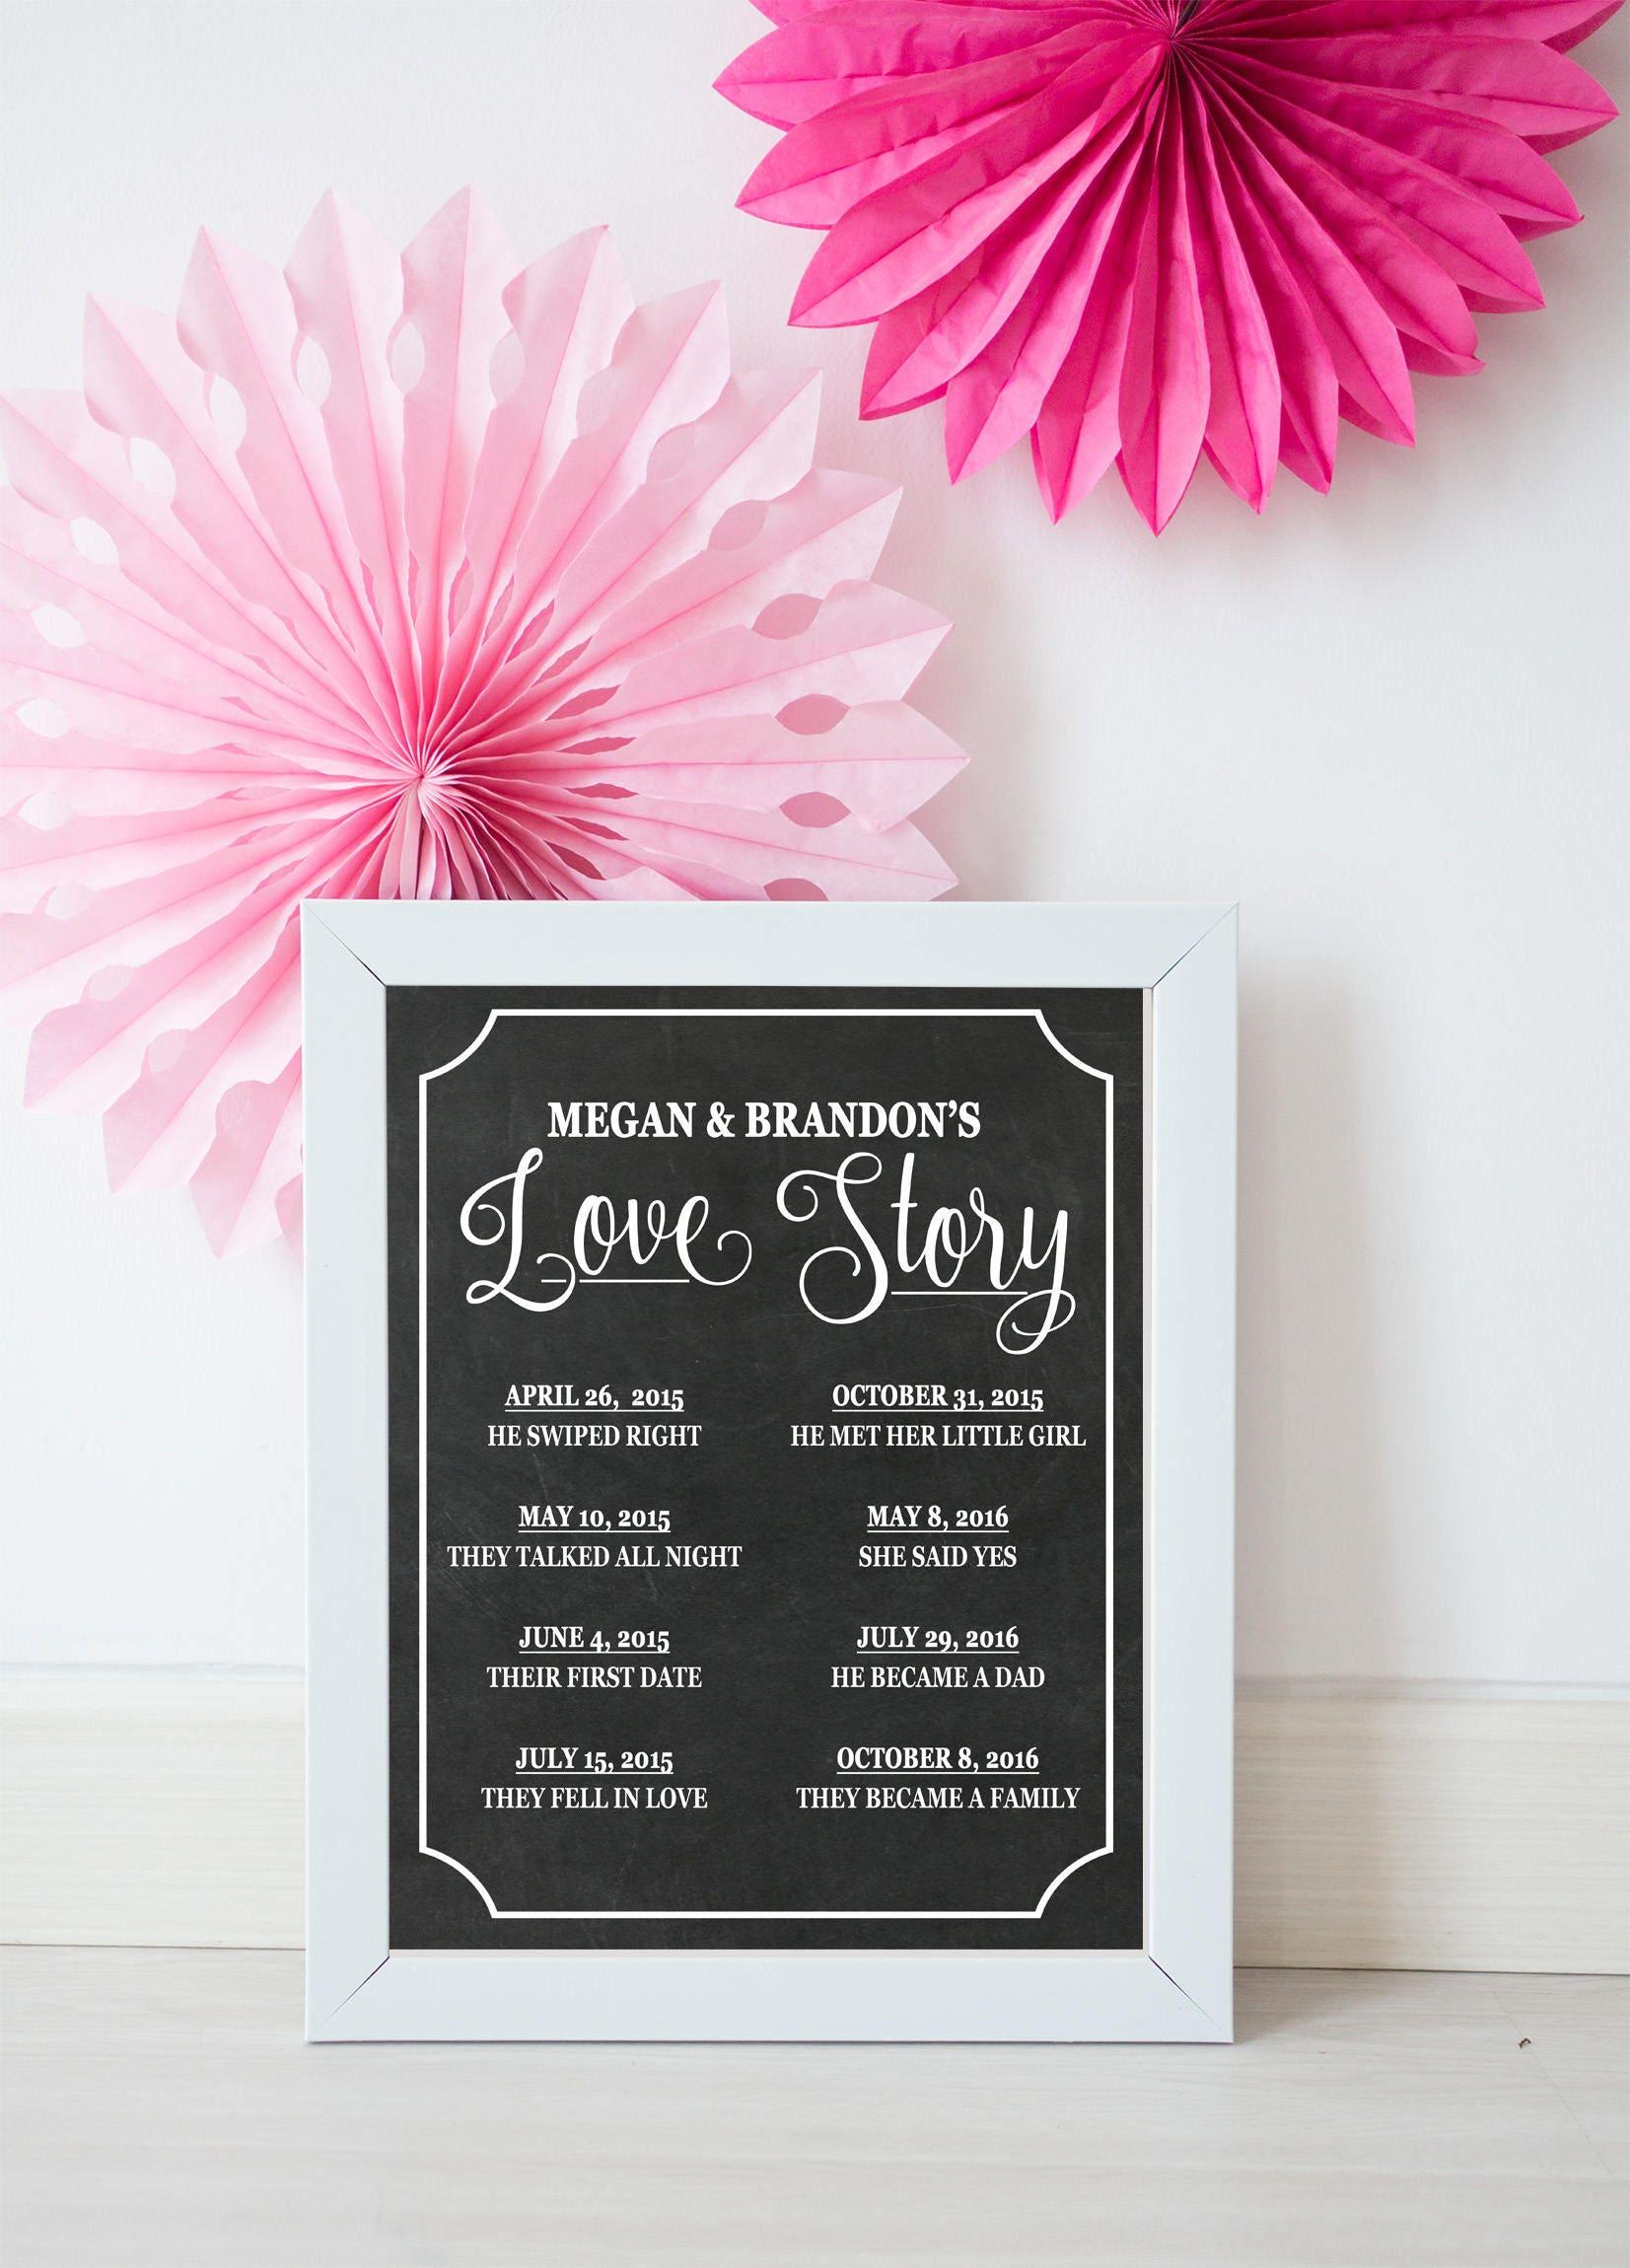 LOVE STORY SIGN Chalkboard Love Story Sign Wedding Decor | Etsy